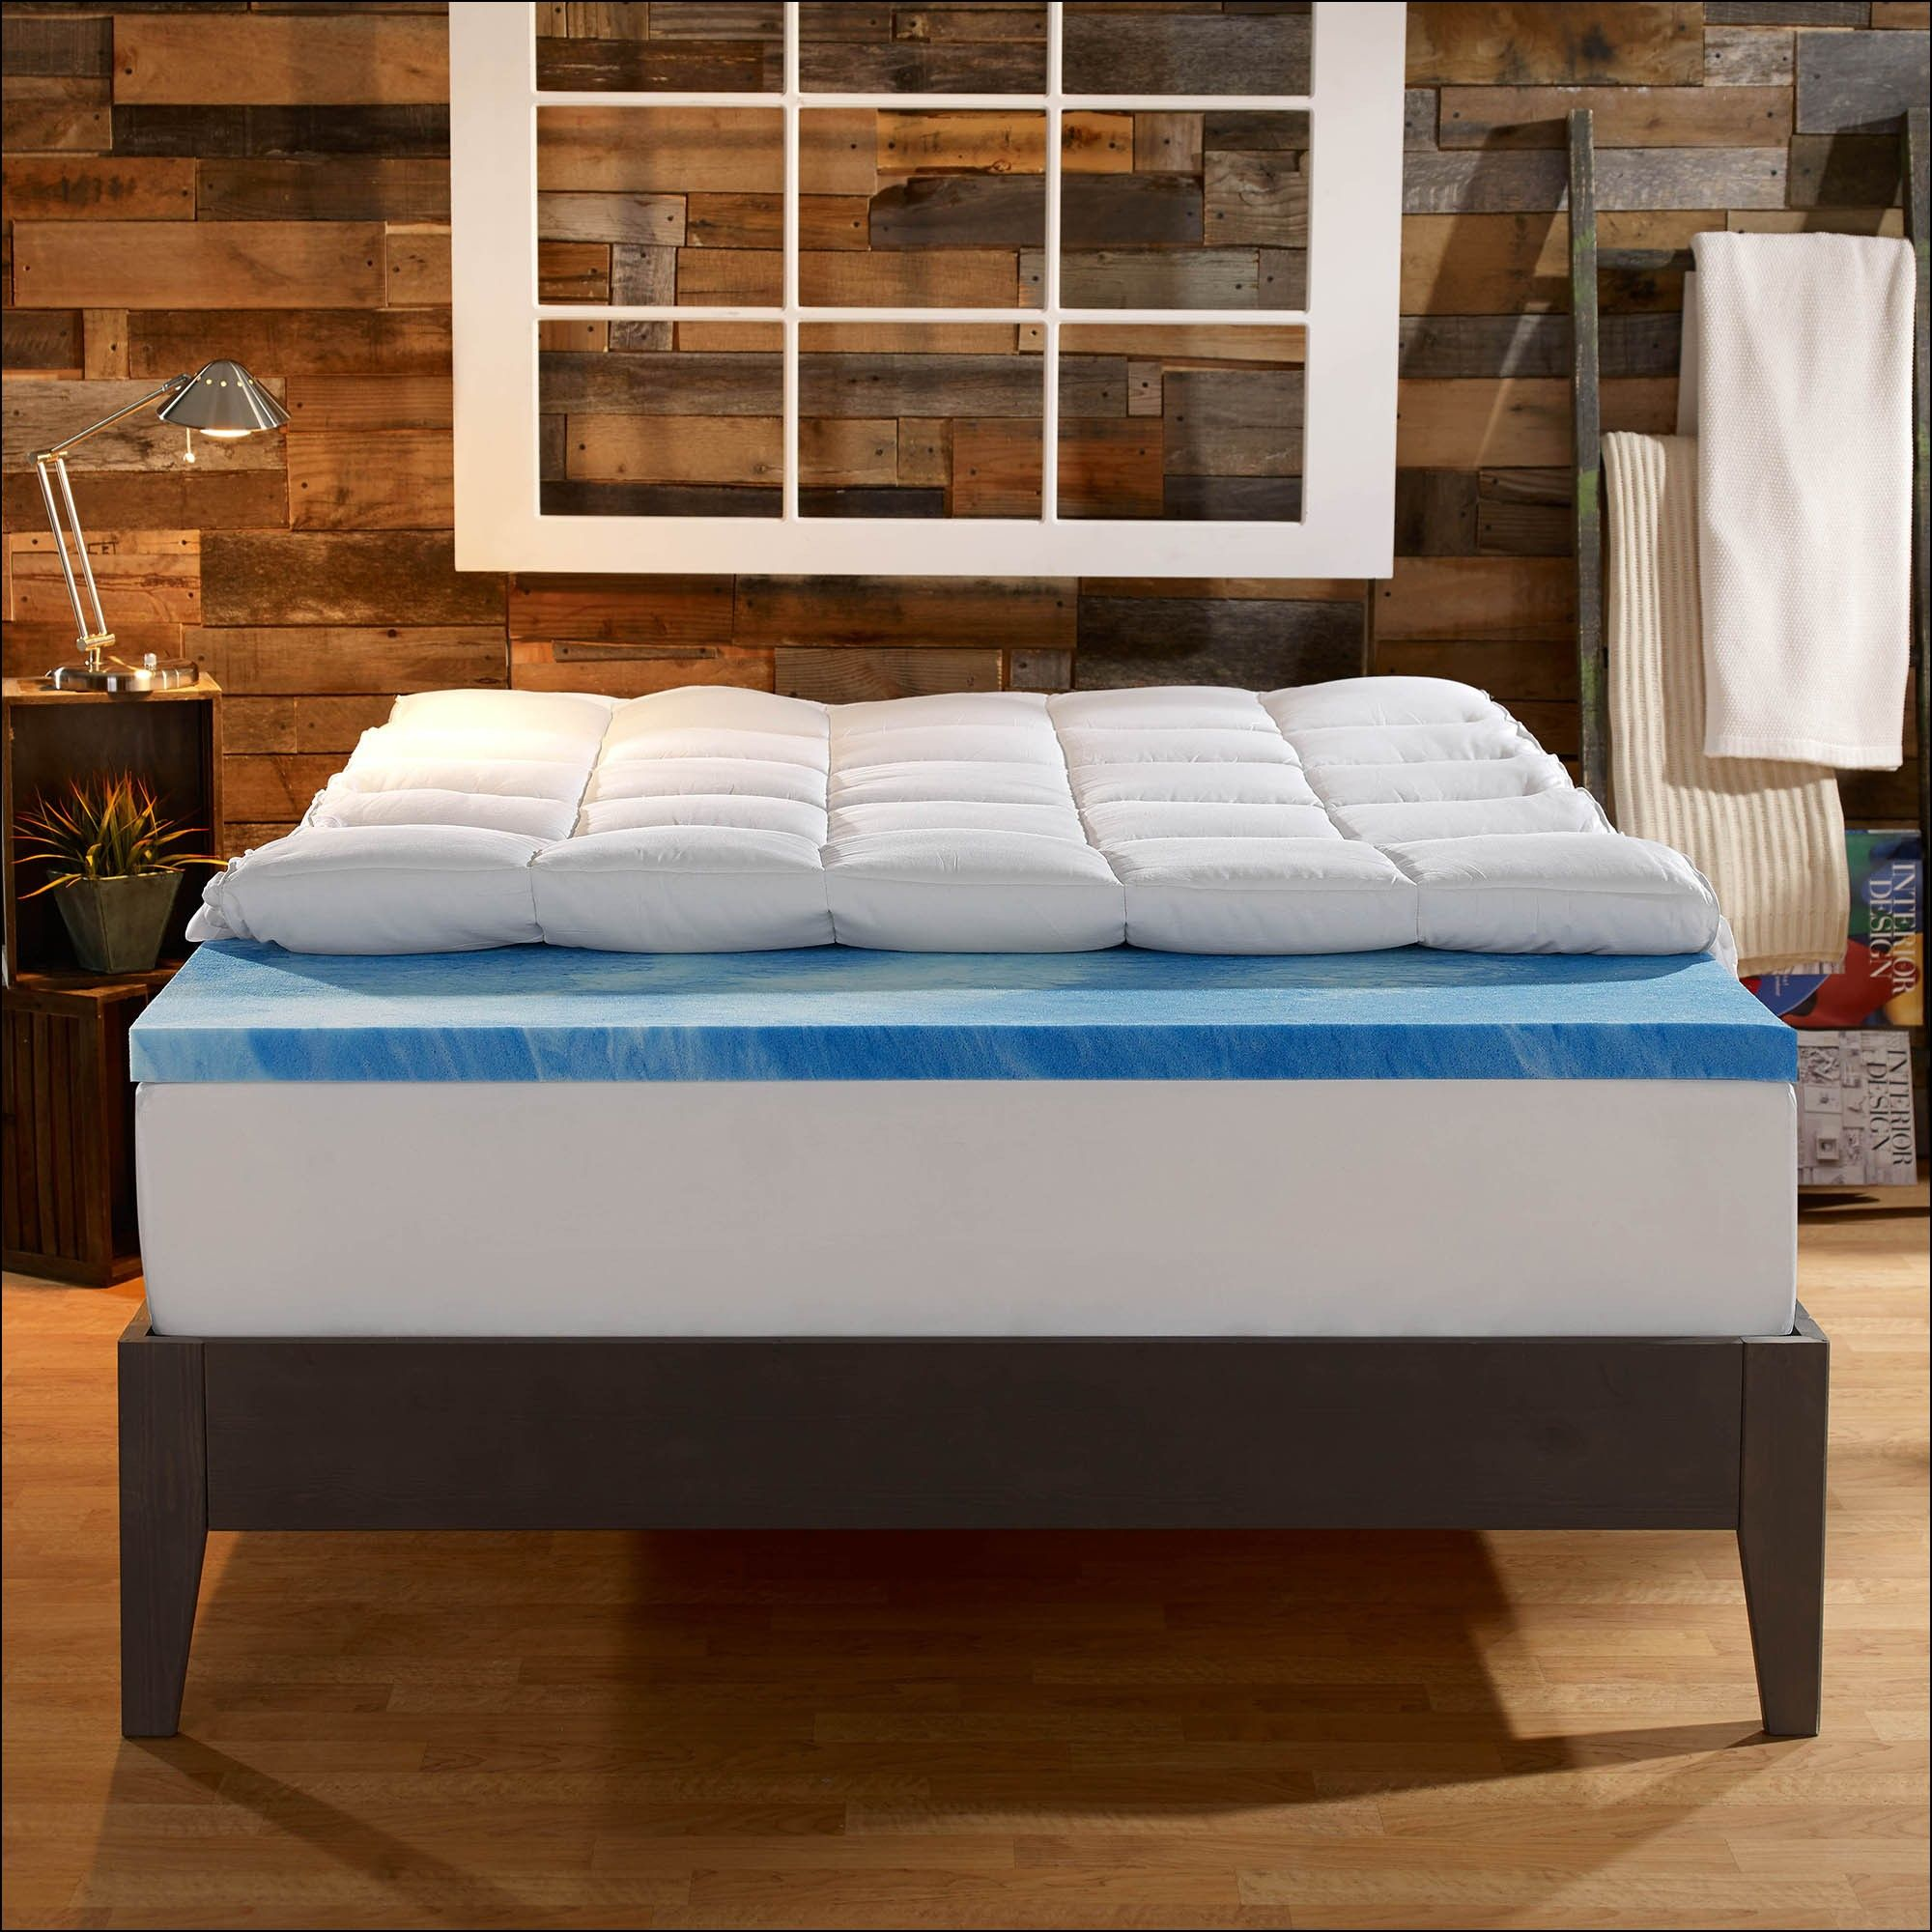 memory foam mattress topper twin xl 4 inch Memory Foam Mattress topper Twin Xl 4 Inch | Mattress Ideas  memory foam mattress topper twin xl 4 inch